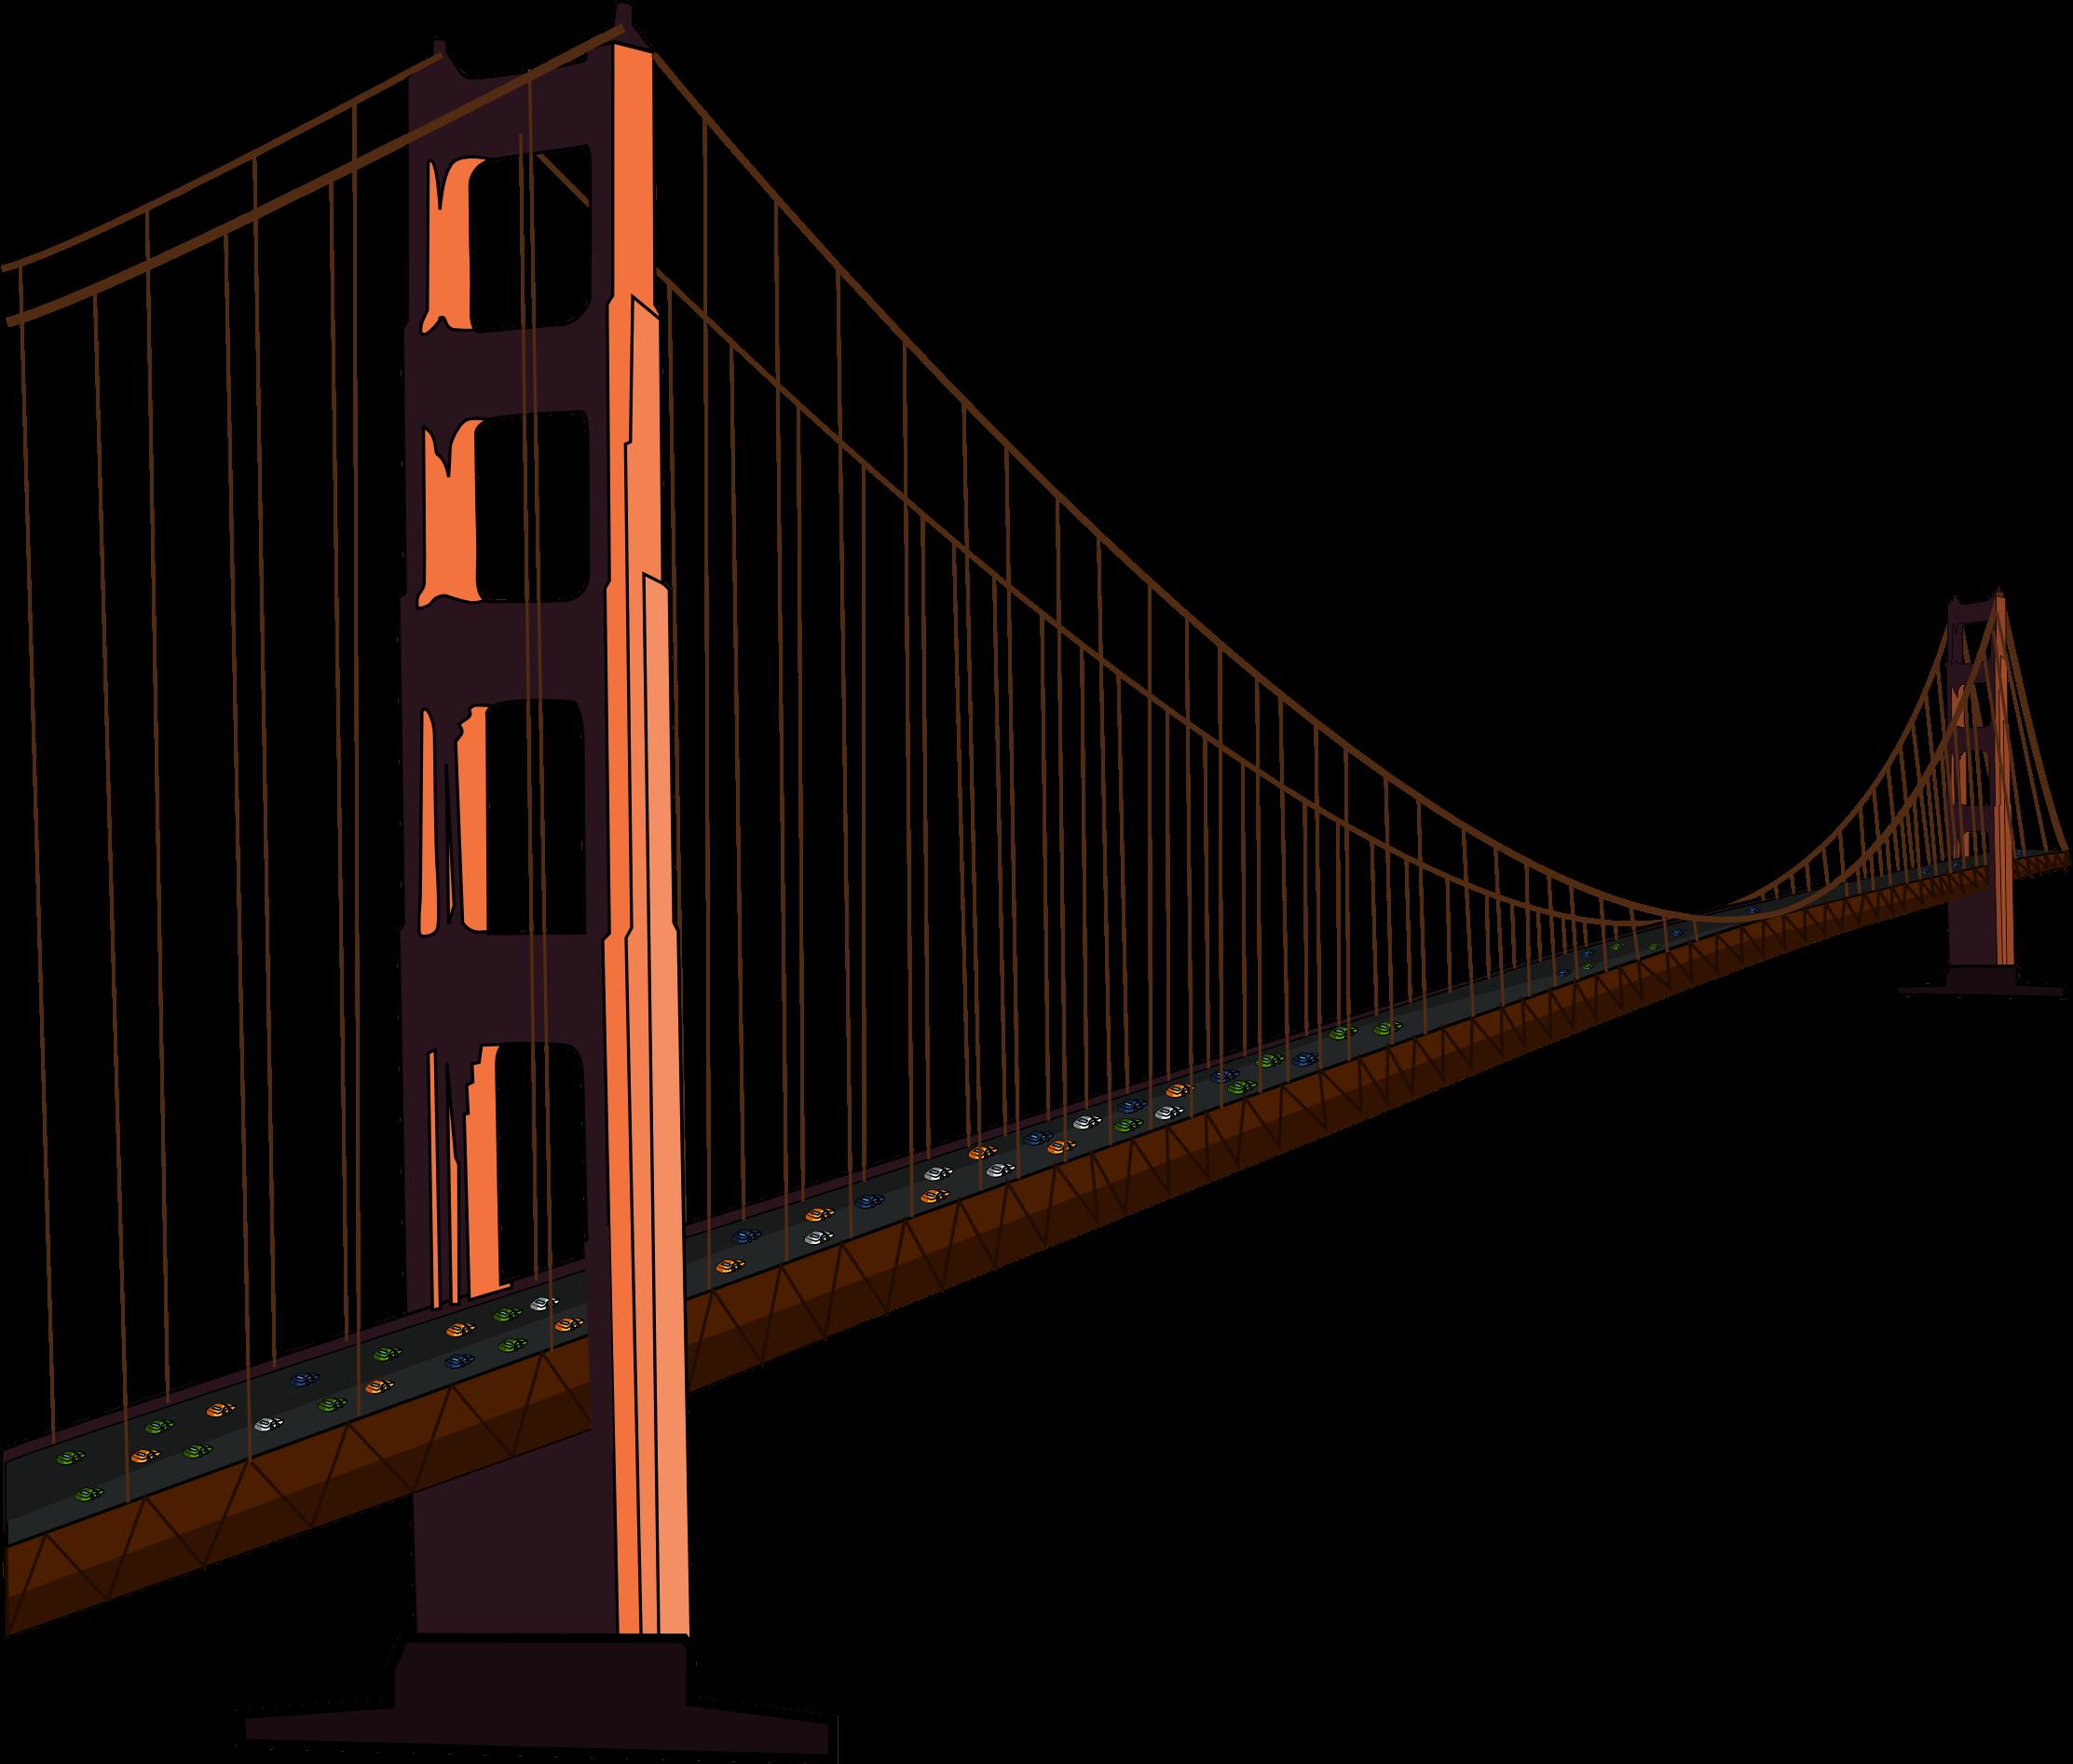 2225x1893 Drawing Golden Gate Bridge